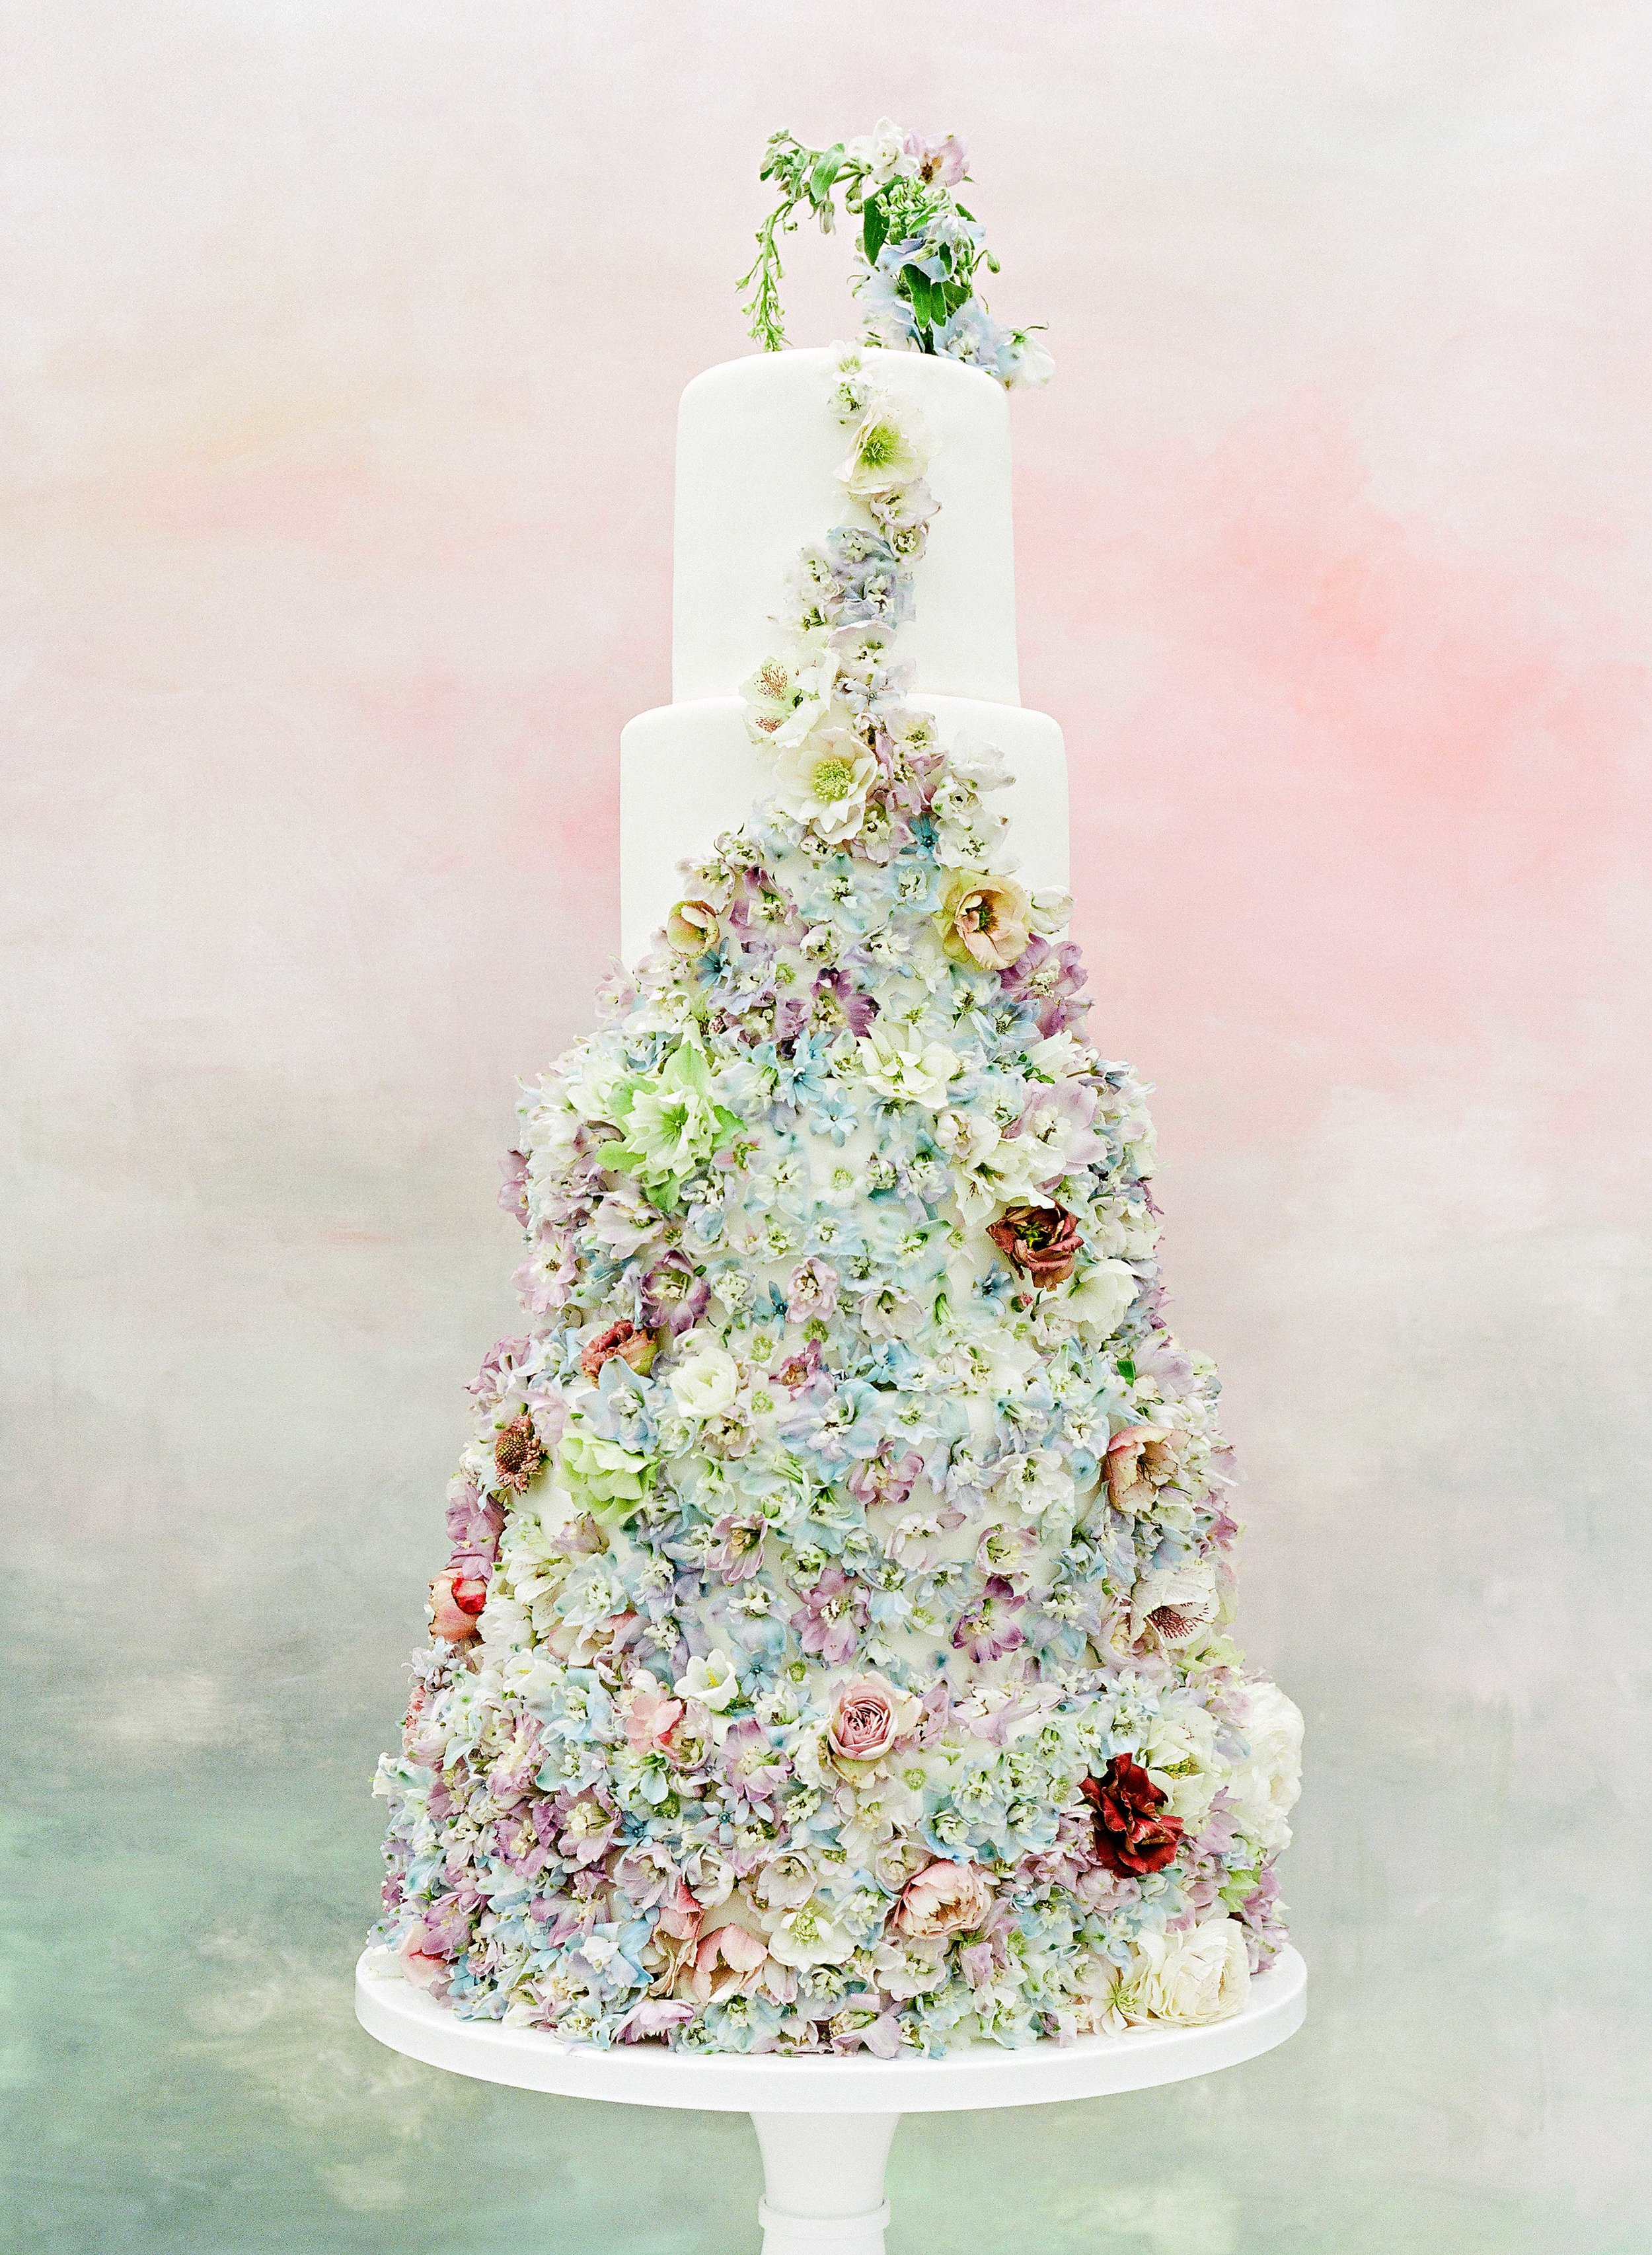 rebecca-clay-wedding-north-carolina-cakes-103228813.jpg